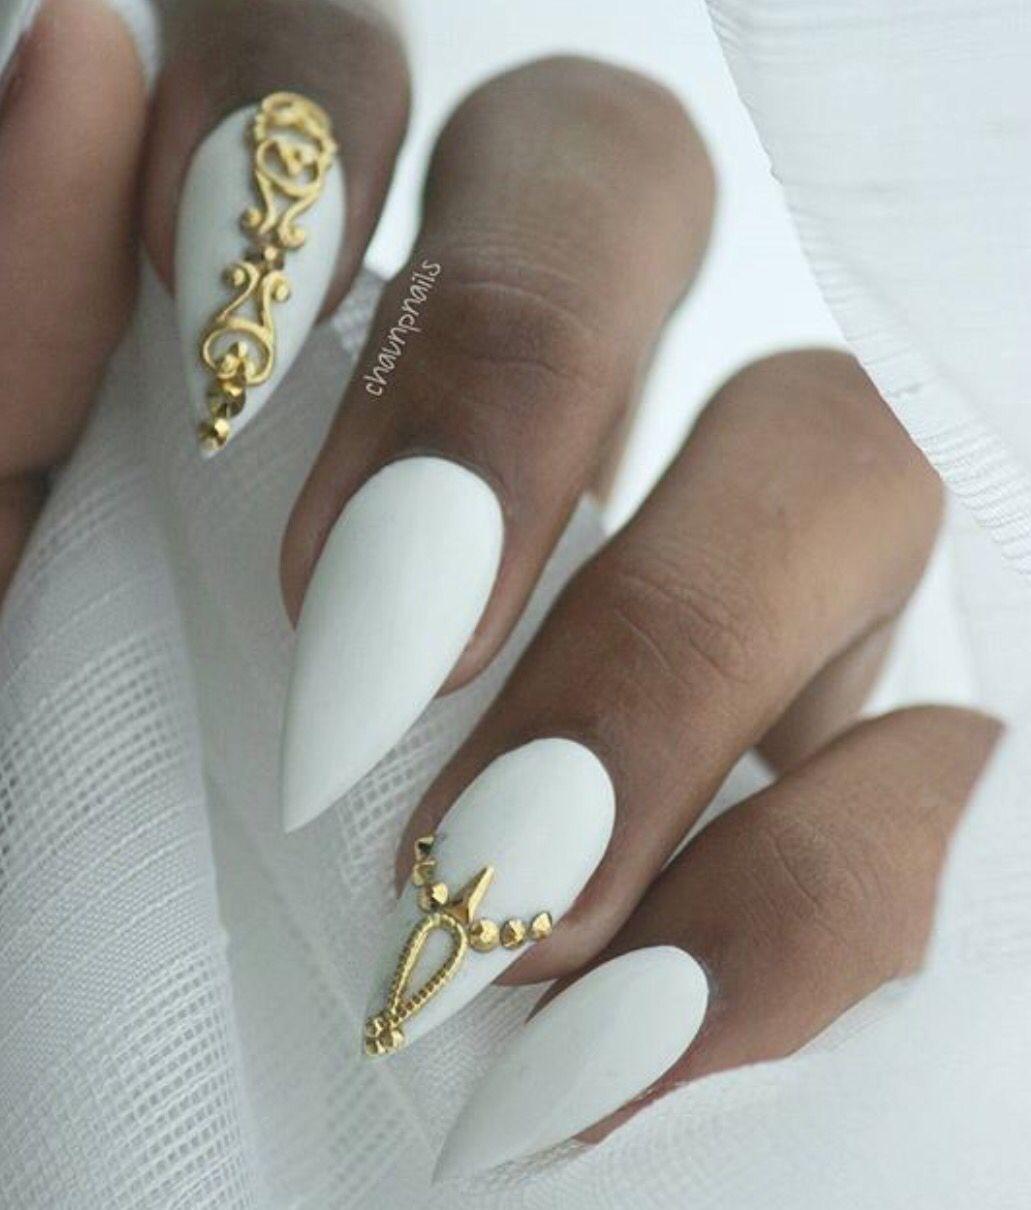 ̗̀•♡• ̖́- | Nails, nails, and more nails | Pinterest | Manicure ...